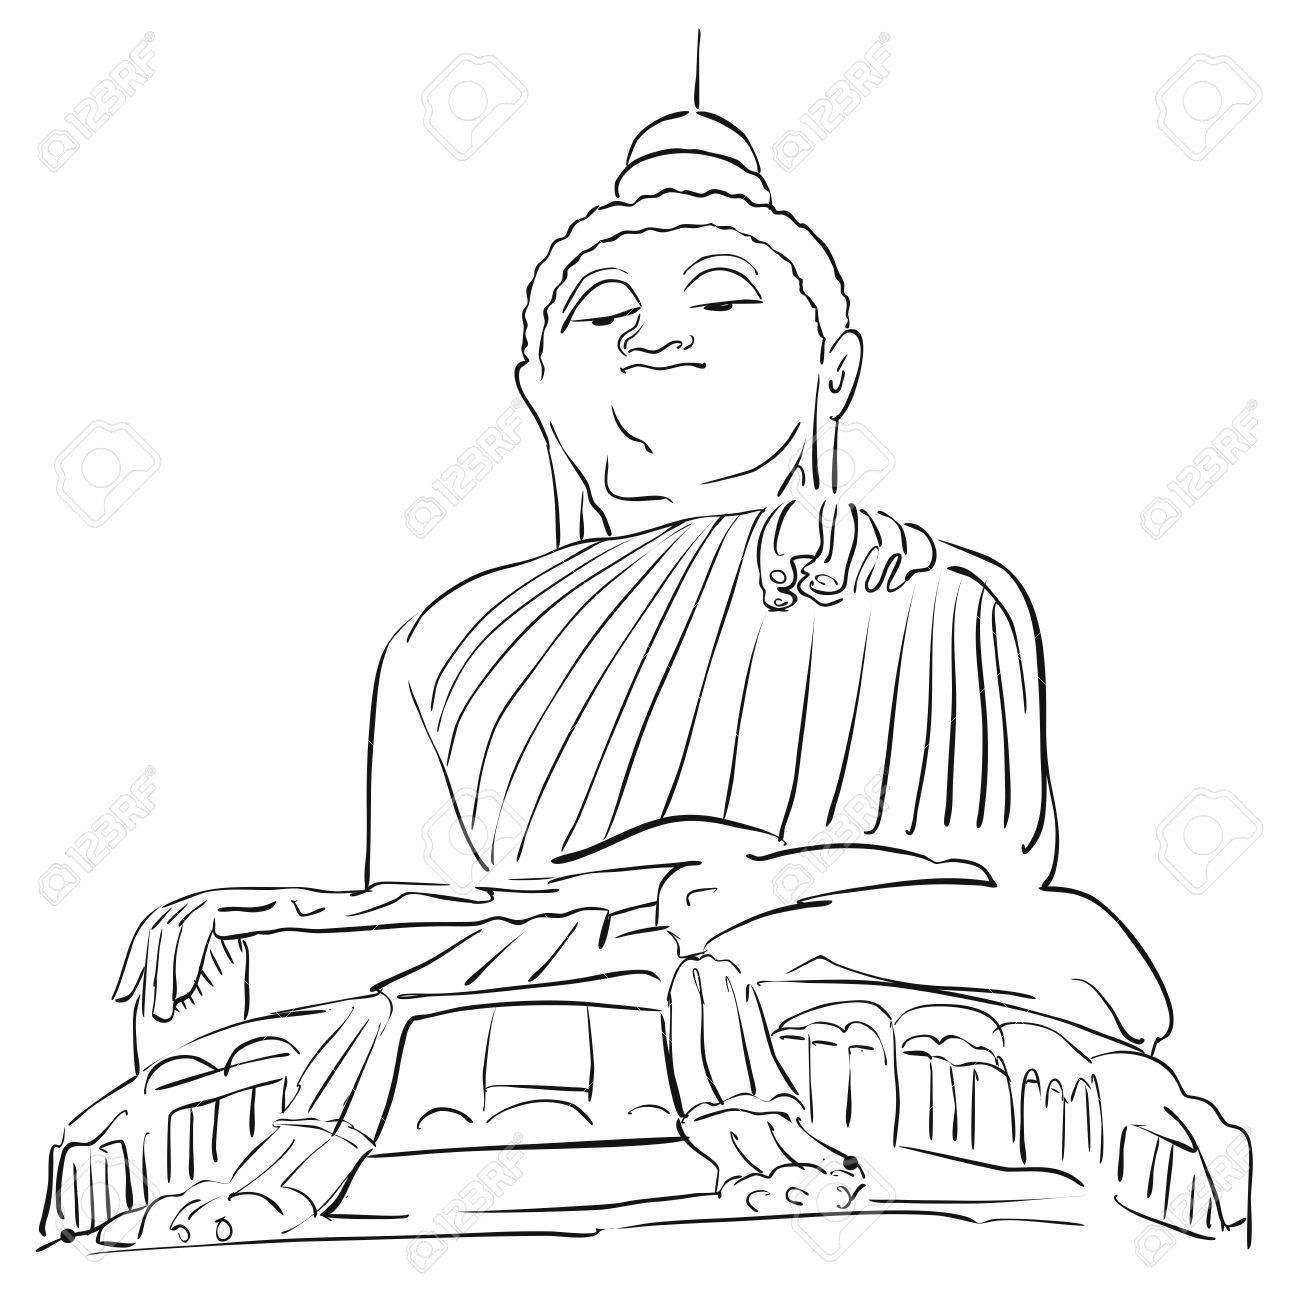 1300x1300 Big Buddha Phuket Outline Sketch, Famous Tourist Lansmark, Hand